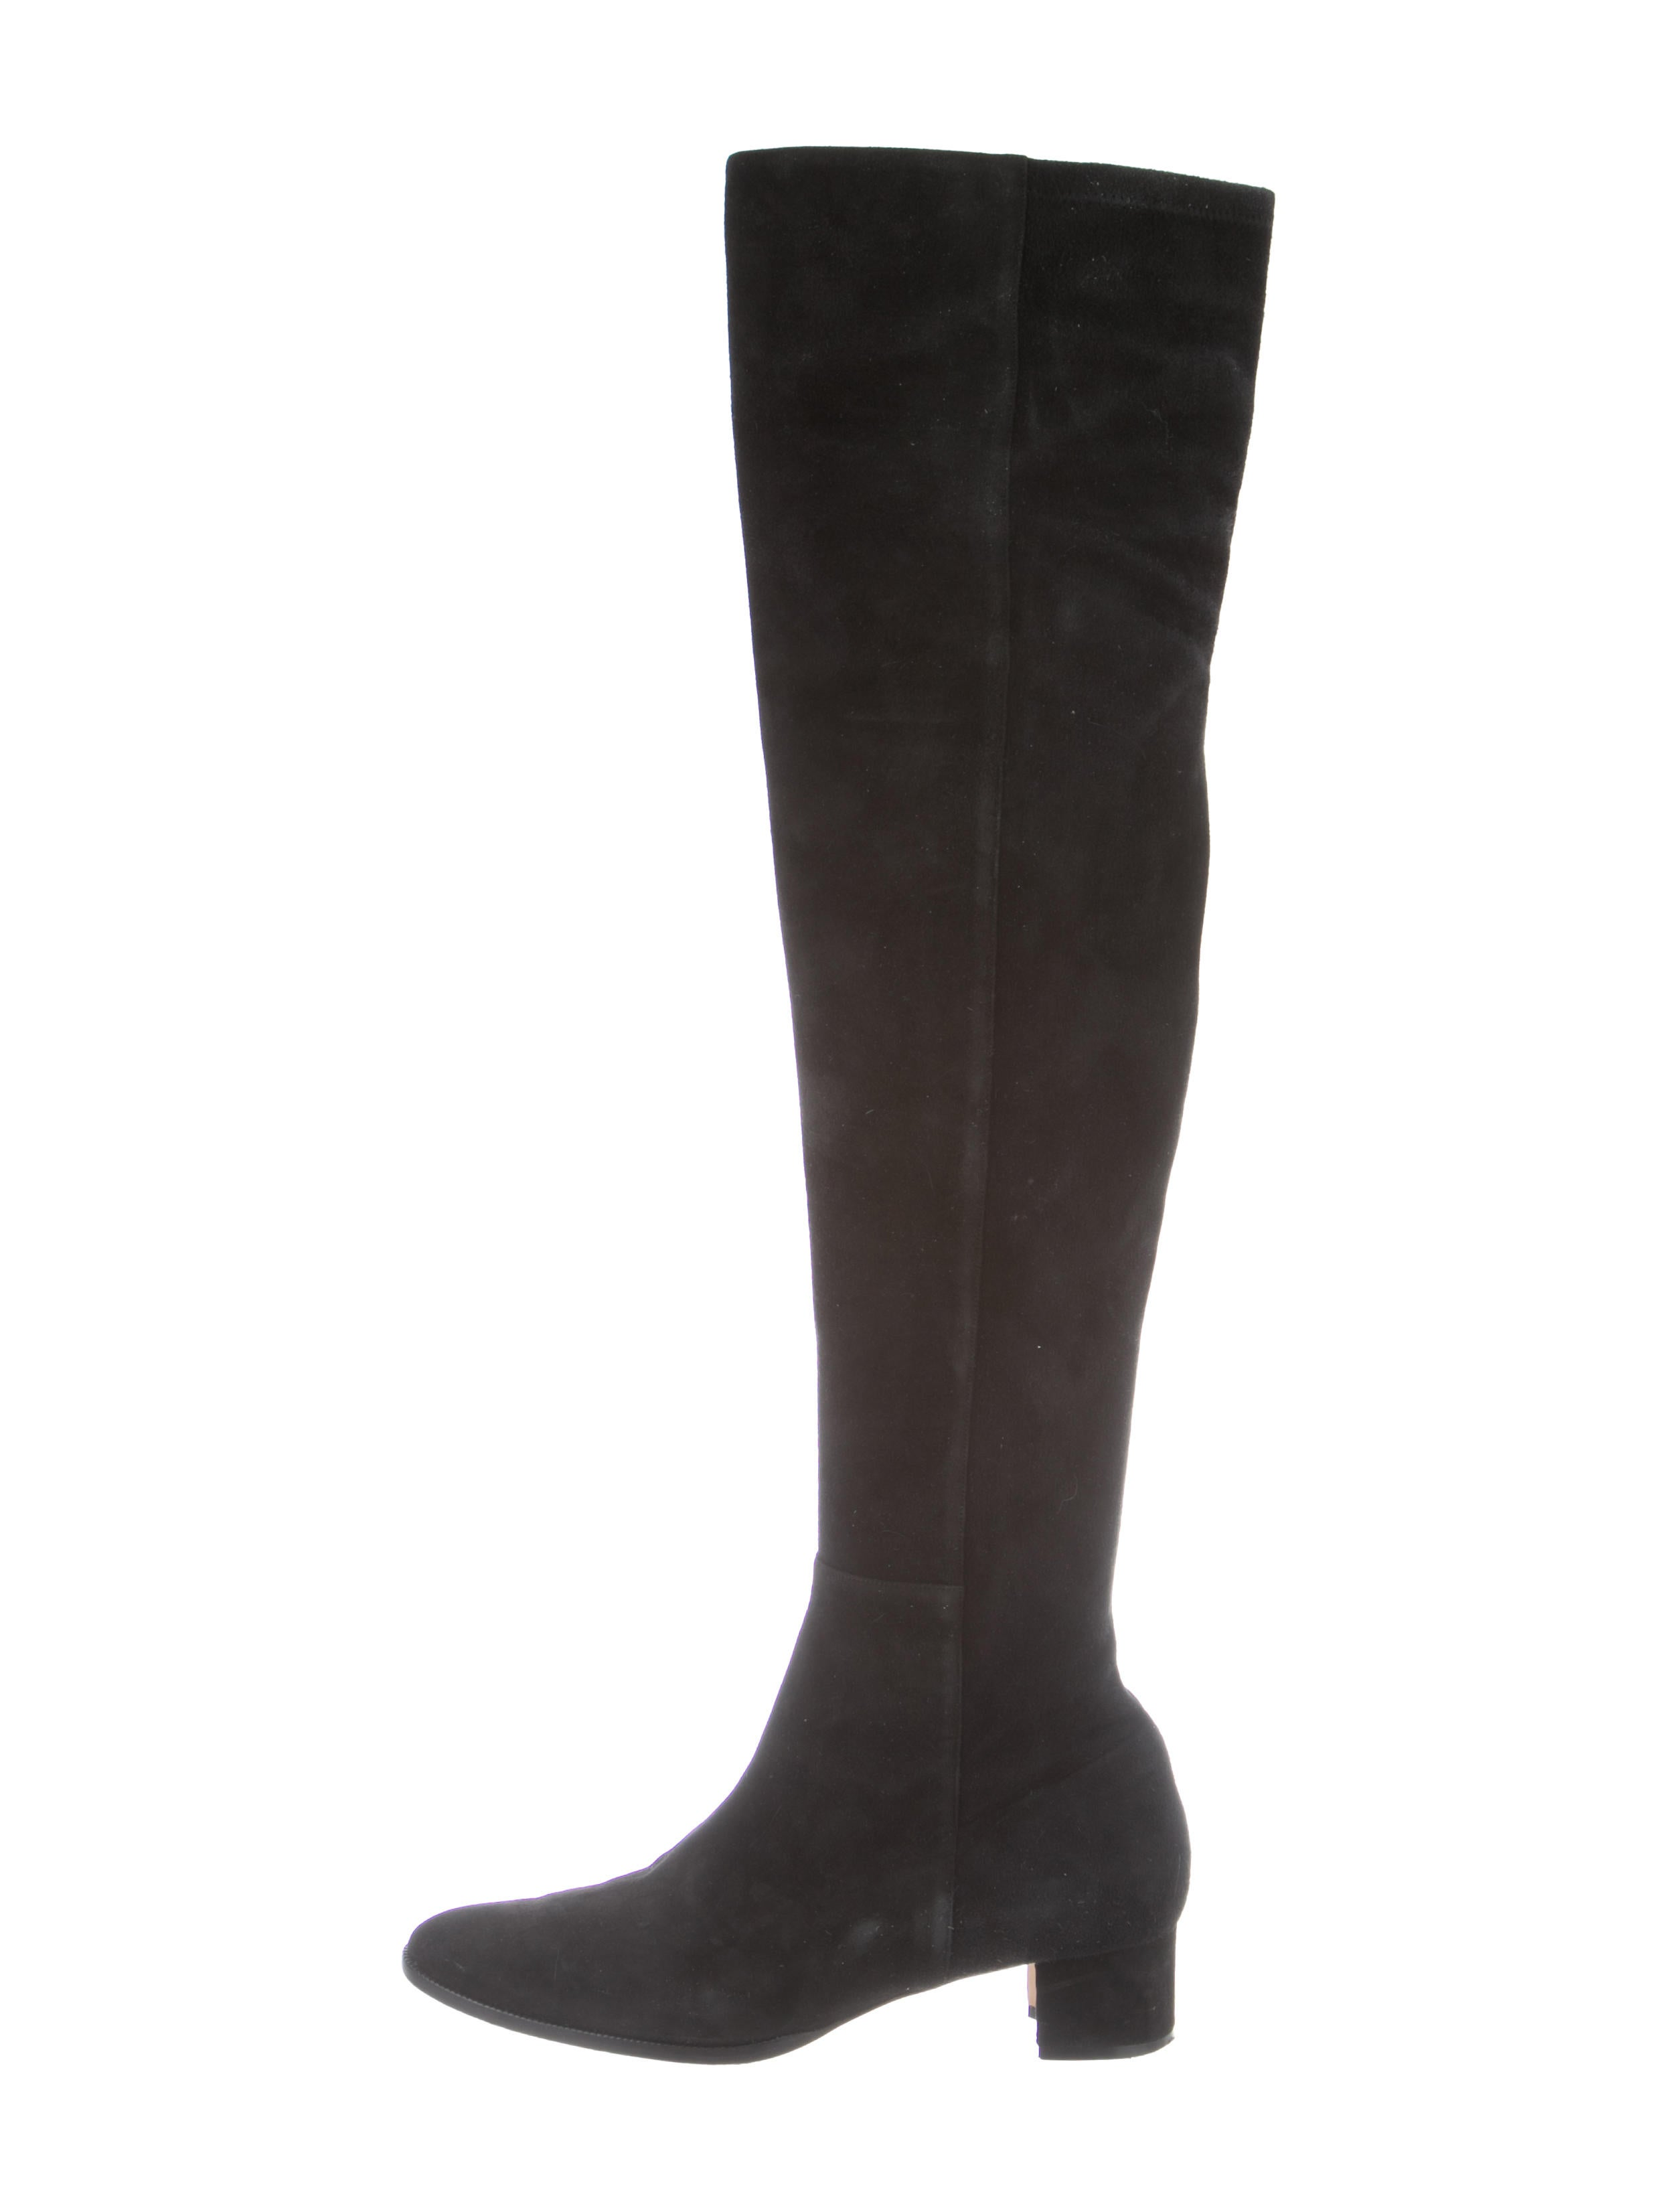 4fa03c8c0e4 Manolo Blahnik Pampahi Over-The-Knee Boots - Shoes - MOO100390